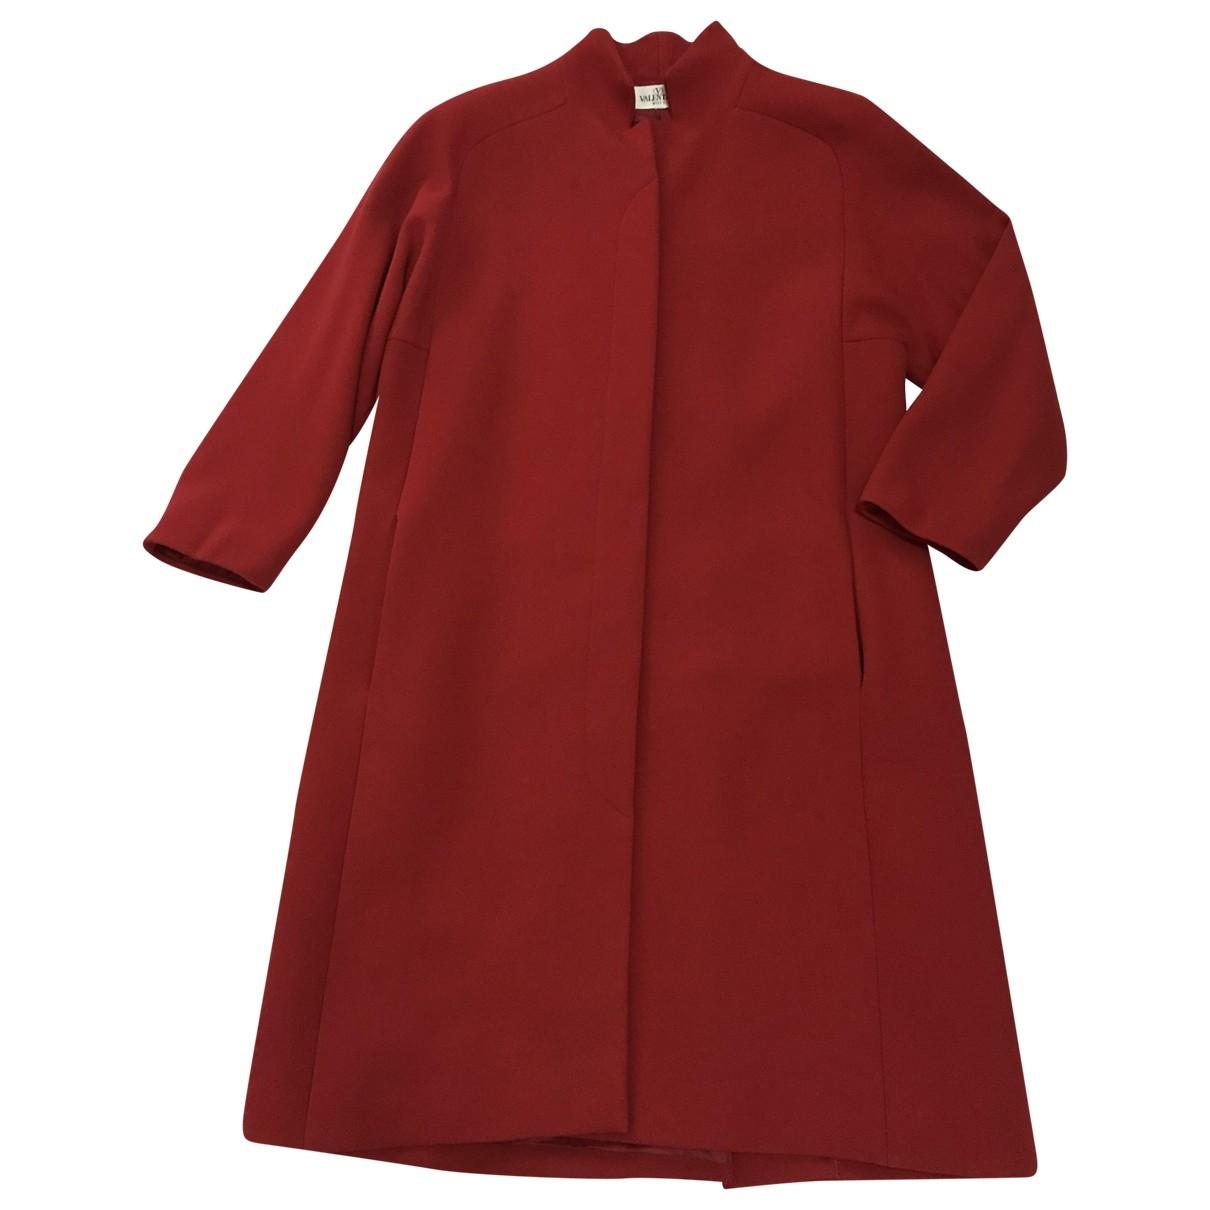 Valentino Garavani \N Red Wool coat for Women L International